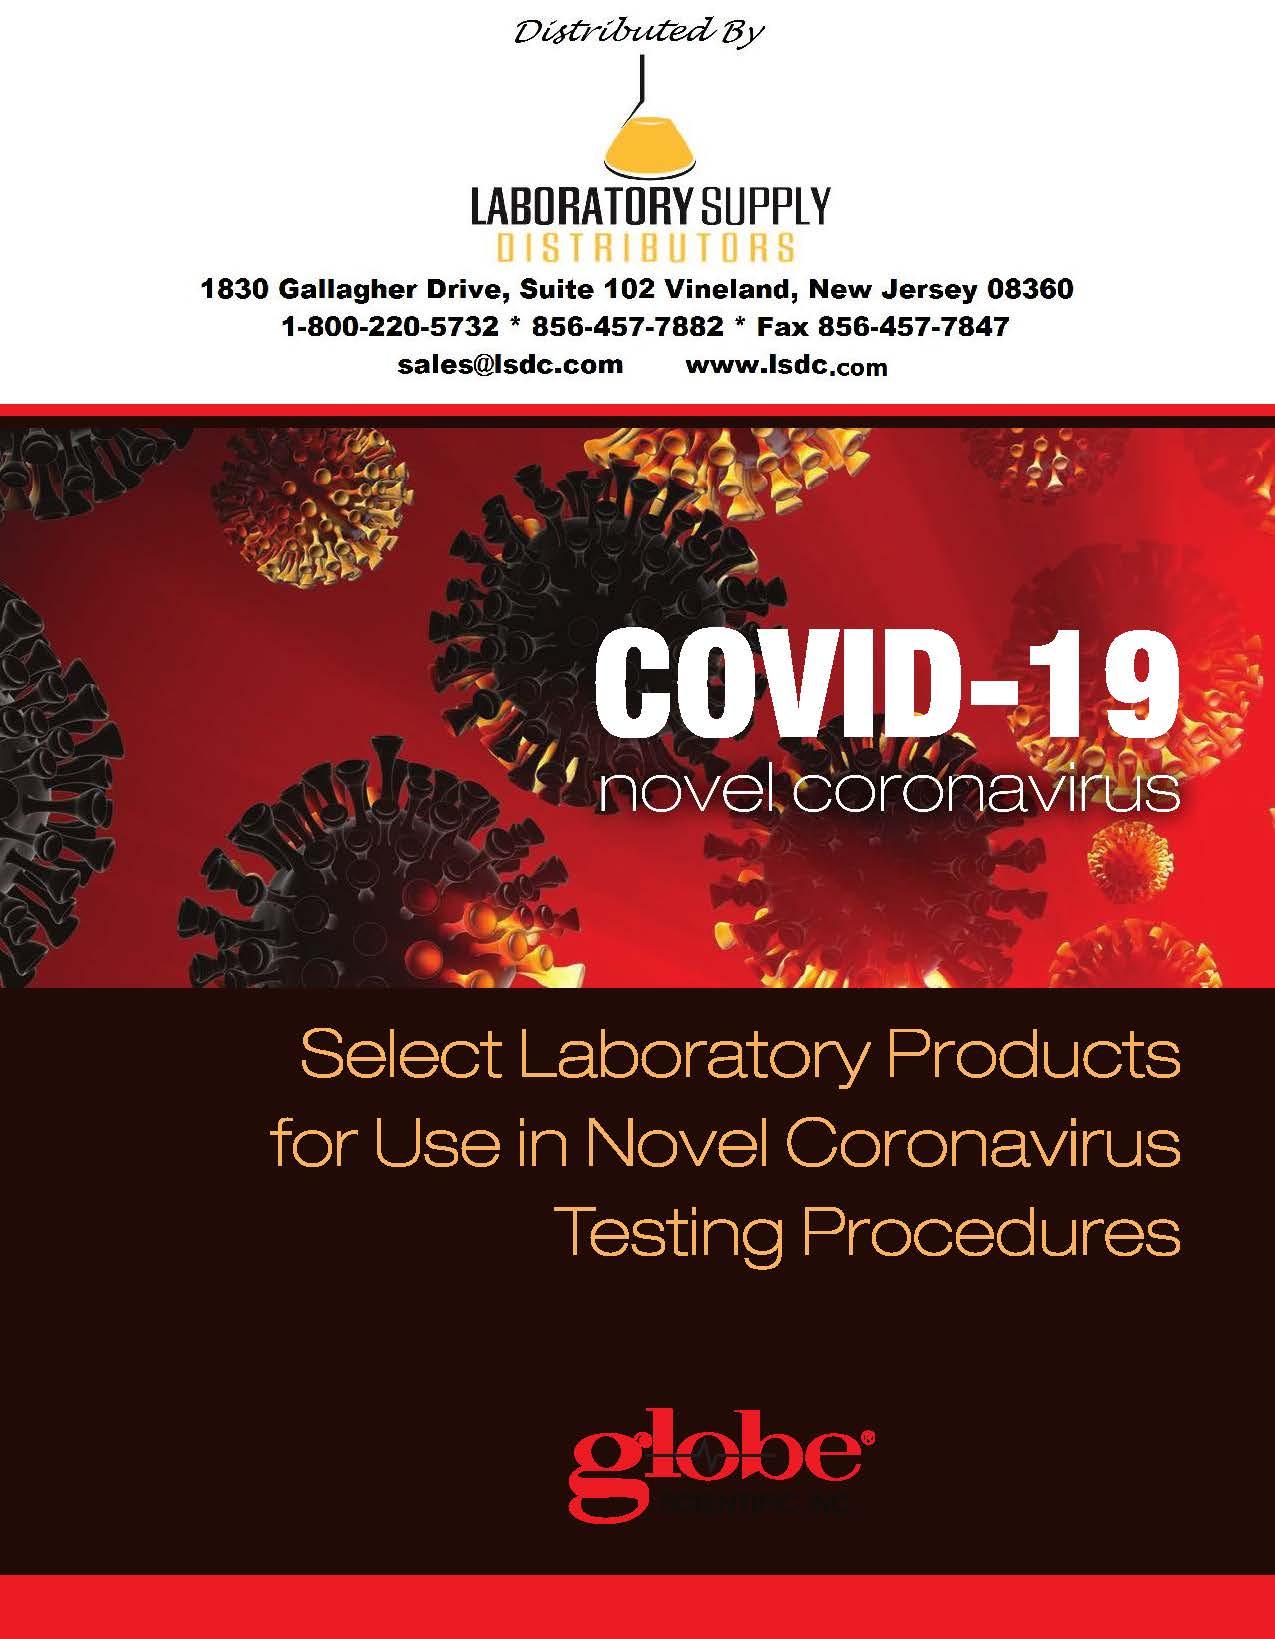 COVID-19 Lab Products eCatalog